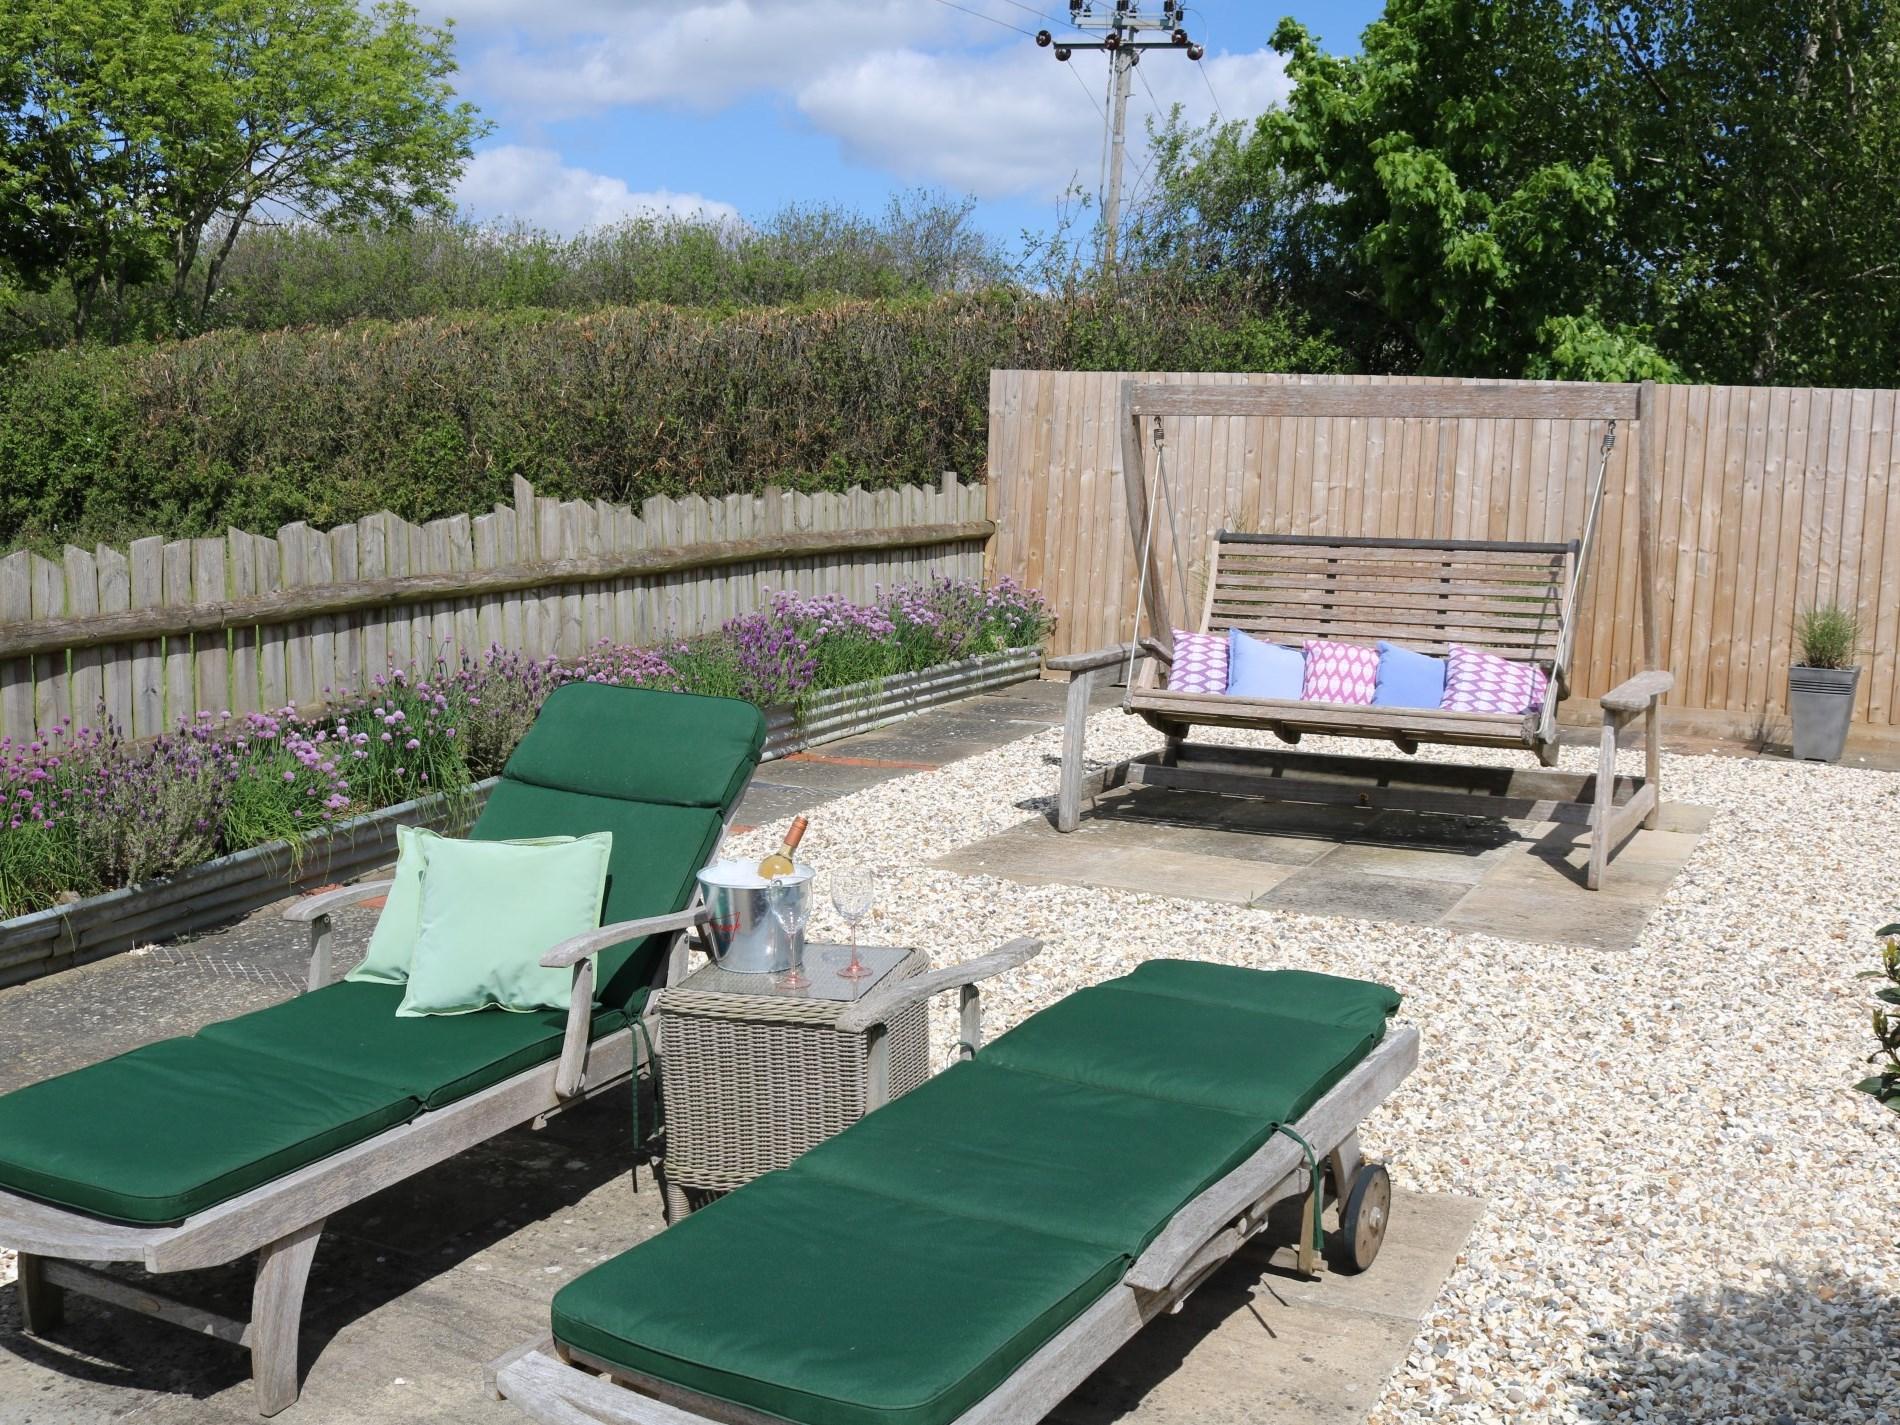 Enclosed garden area to enjoy the sun and fresh air